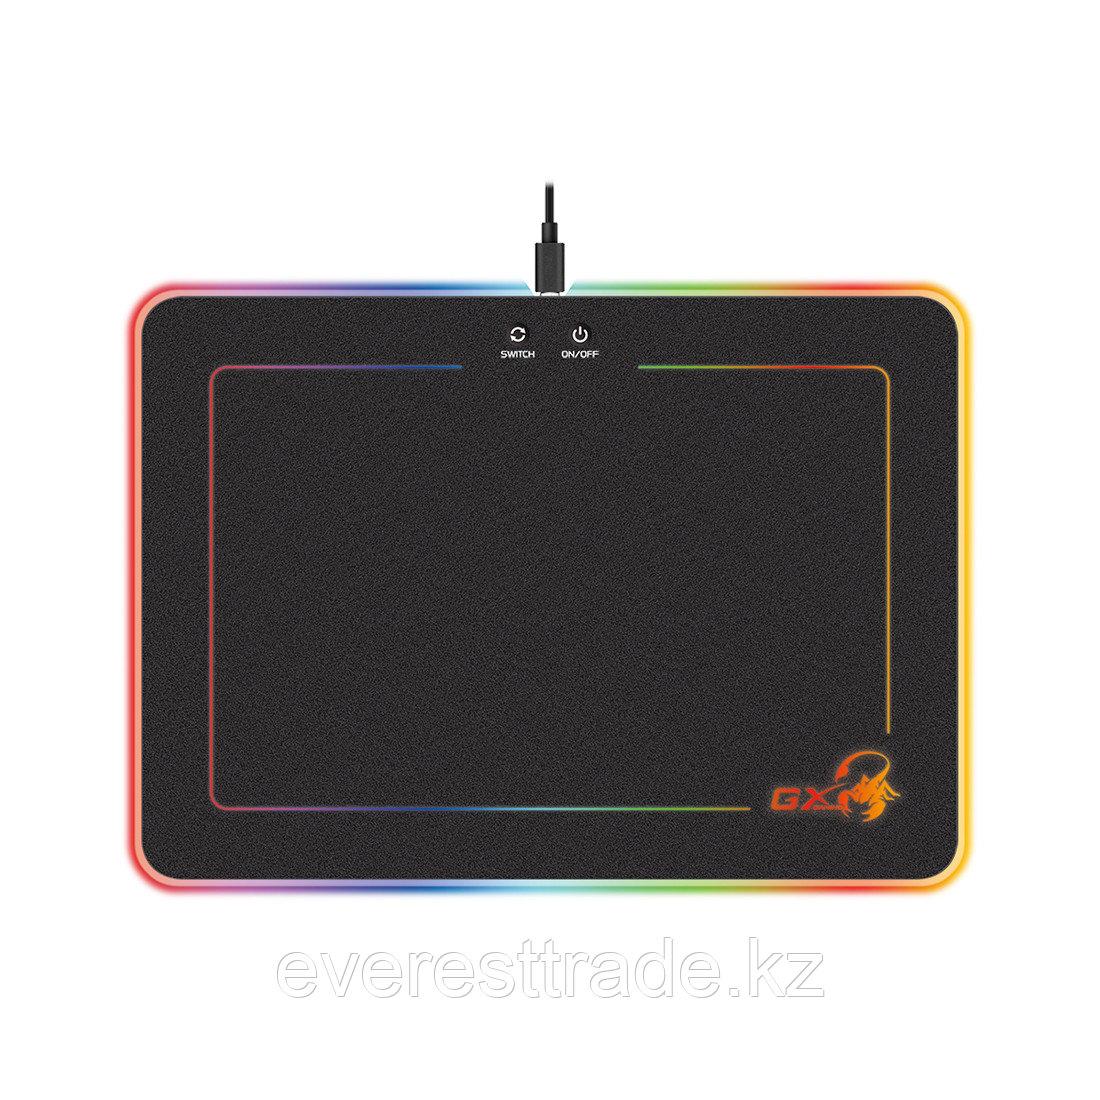 Genius Коврик для мышки Genius GX-Pad 600H RGB